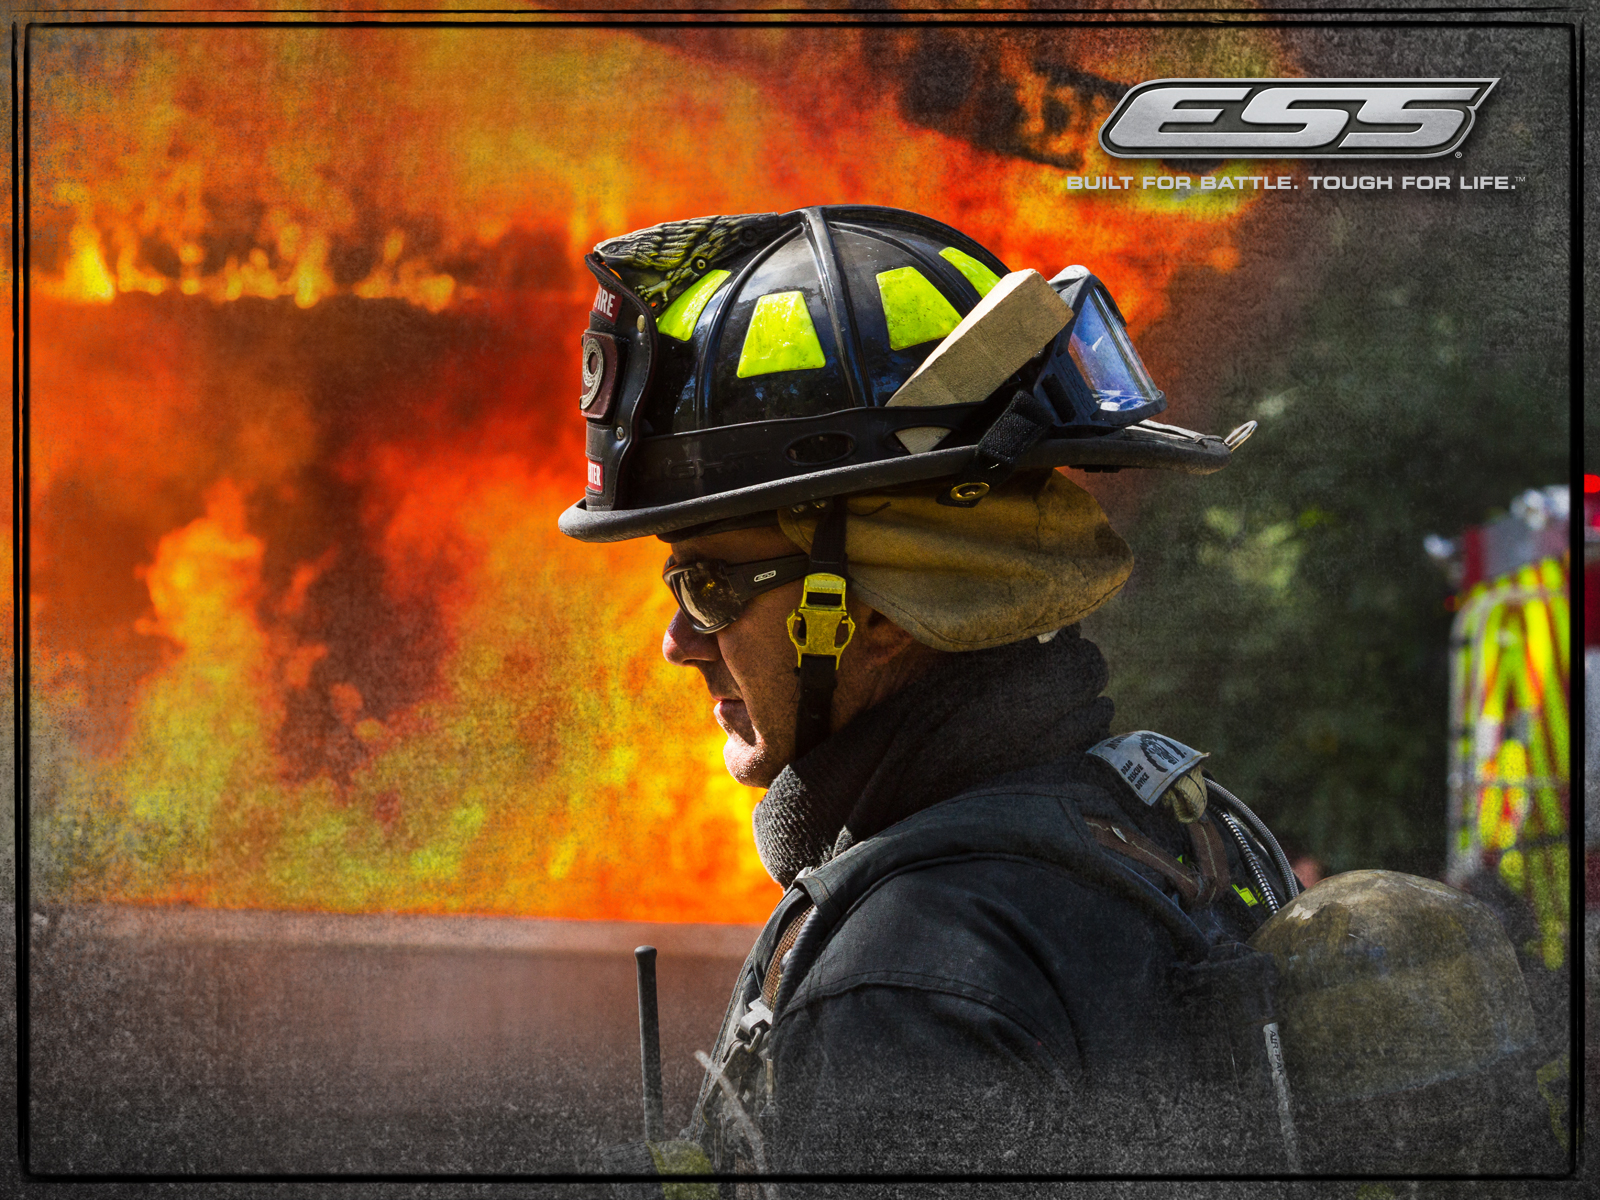 Fire Department Wallpaper Fire department background by 900x563. View 0.  ShutterRunner Photography by Matty Wolin 1024x707